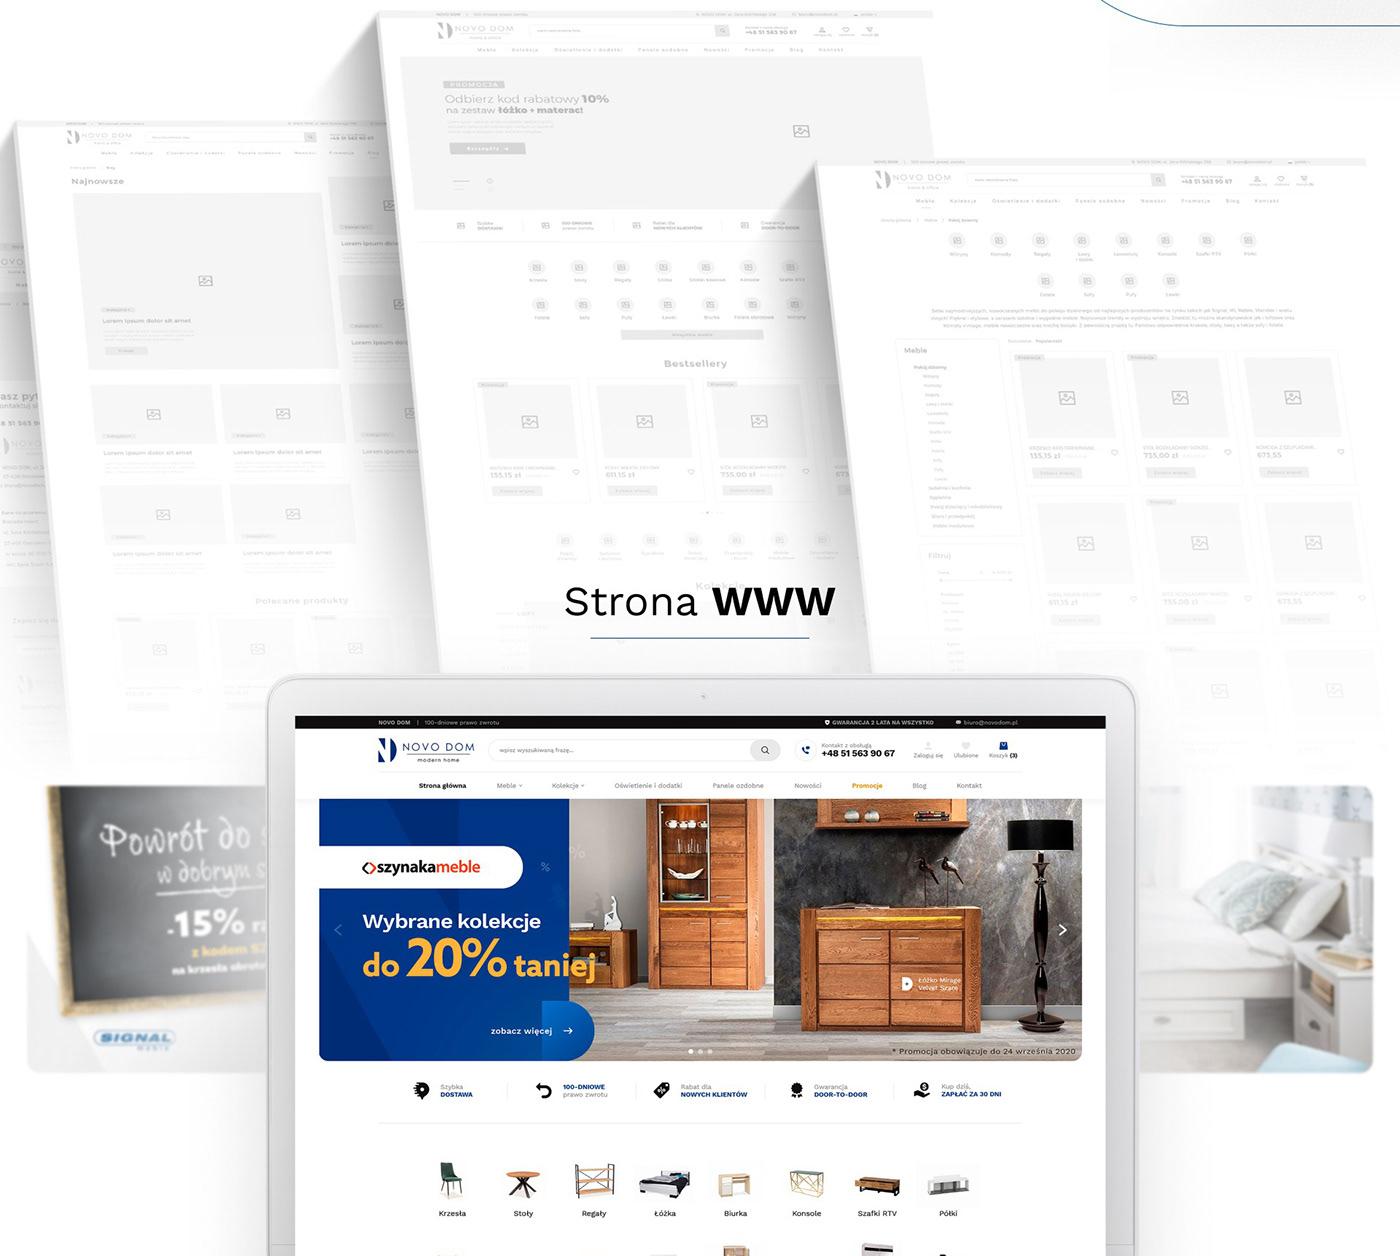 furniture,social media,UI,UI/UX,ux,Web,Web Design